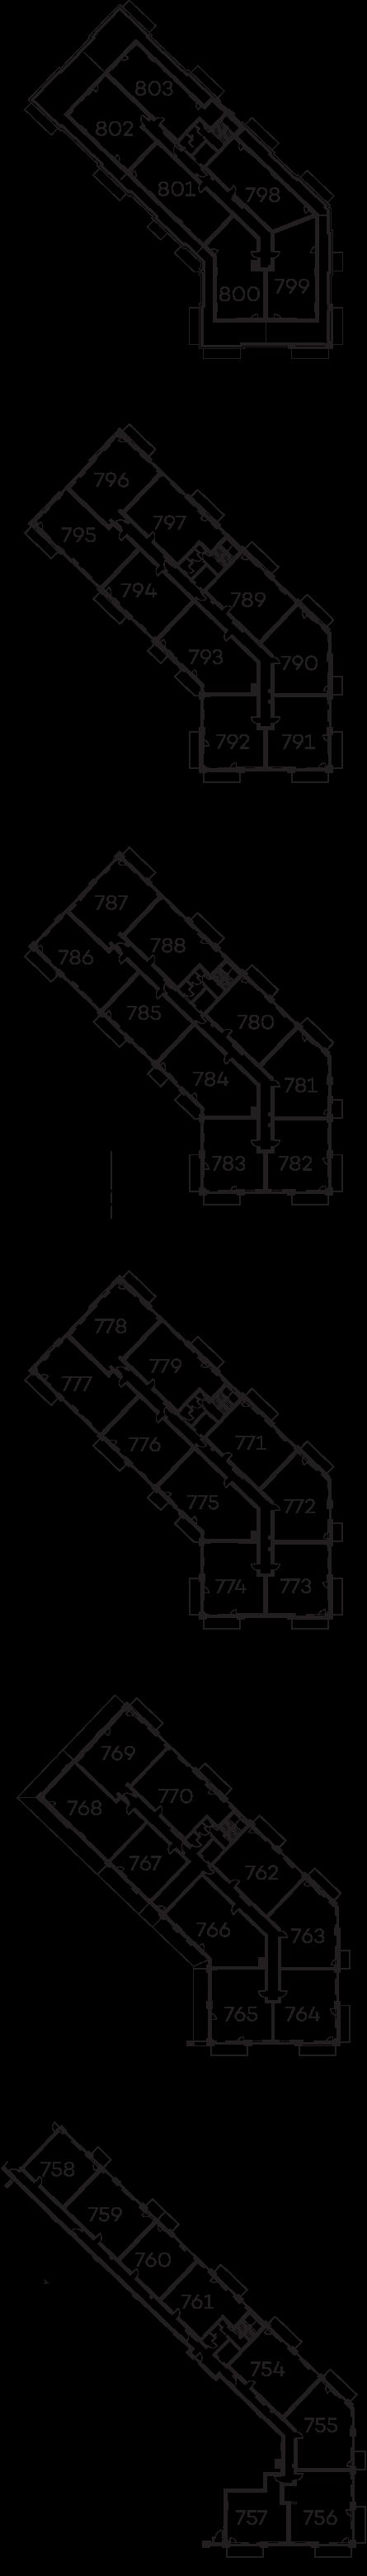 Langley Square